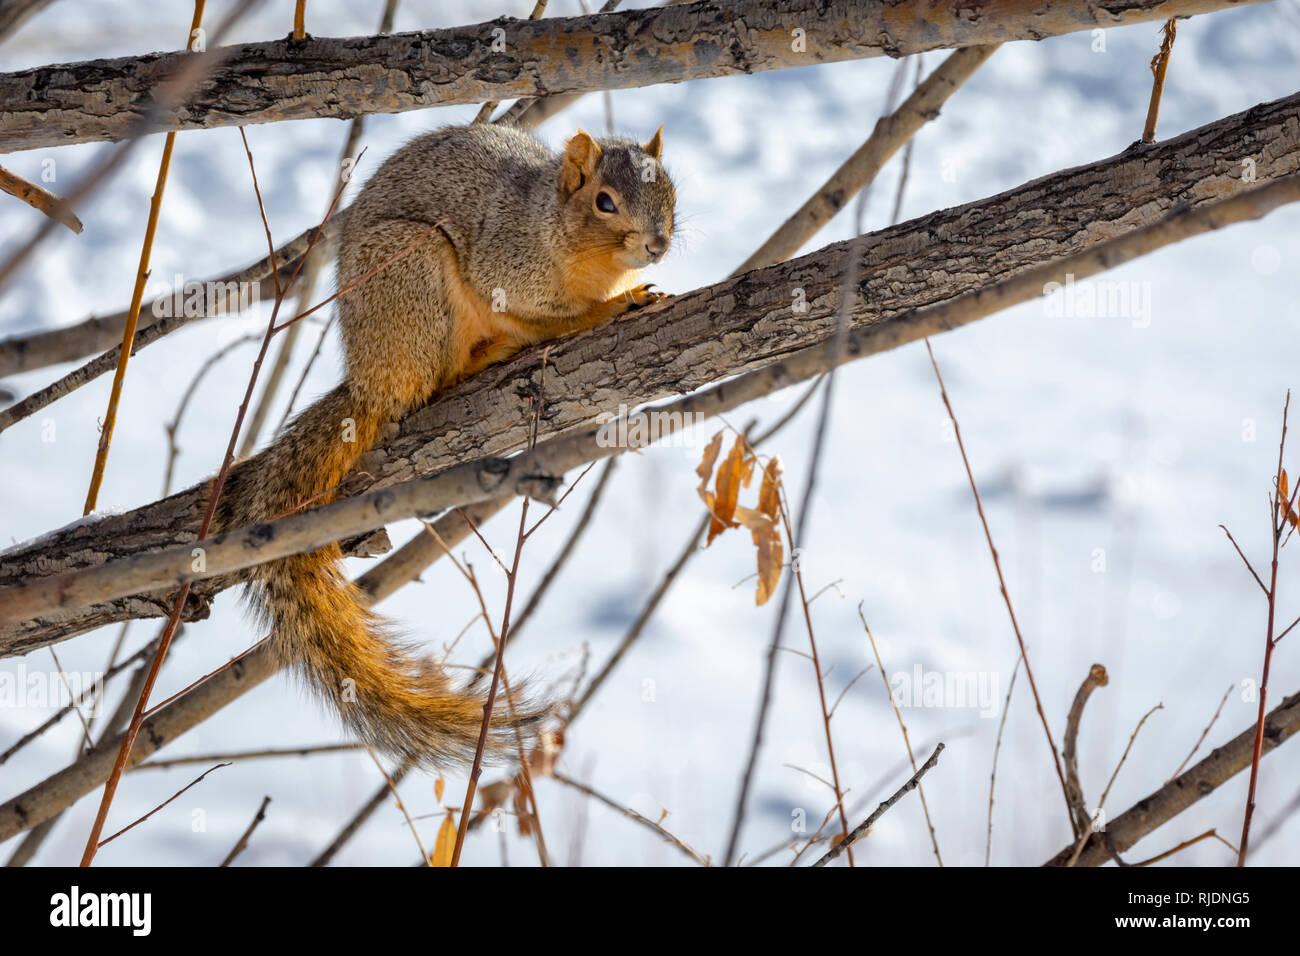 Eastern Fox Squirrel (Sciurus niger) resting in winter, Castle Rock  Colorado US. Photo taken in January. Stock Photo